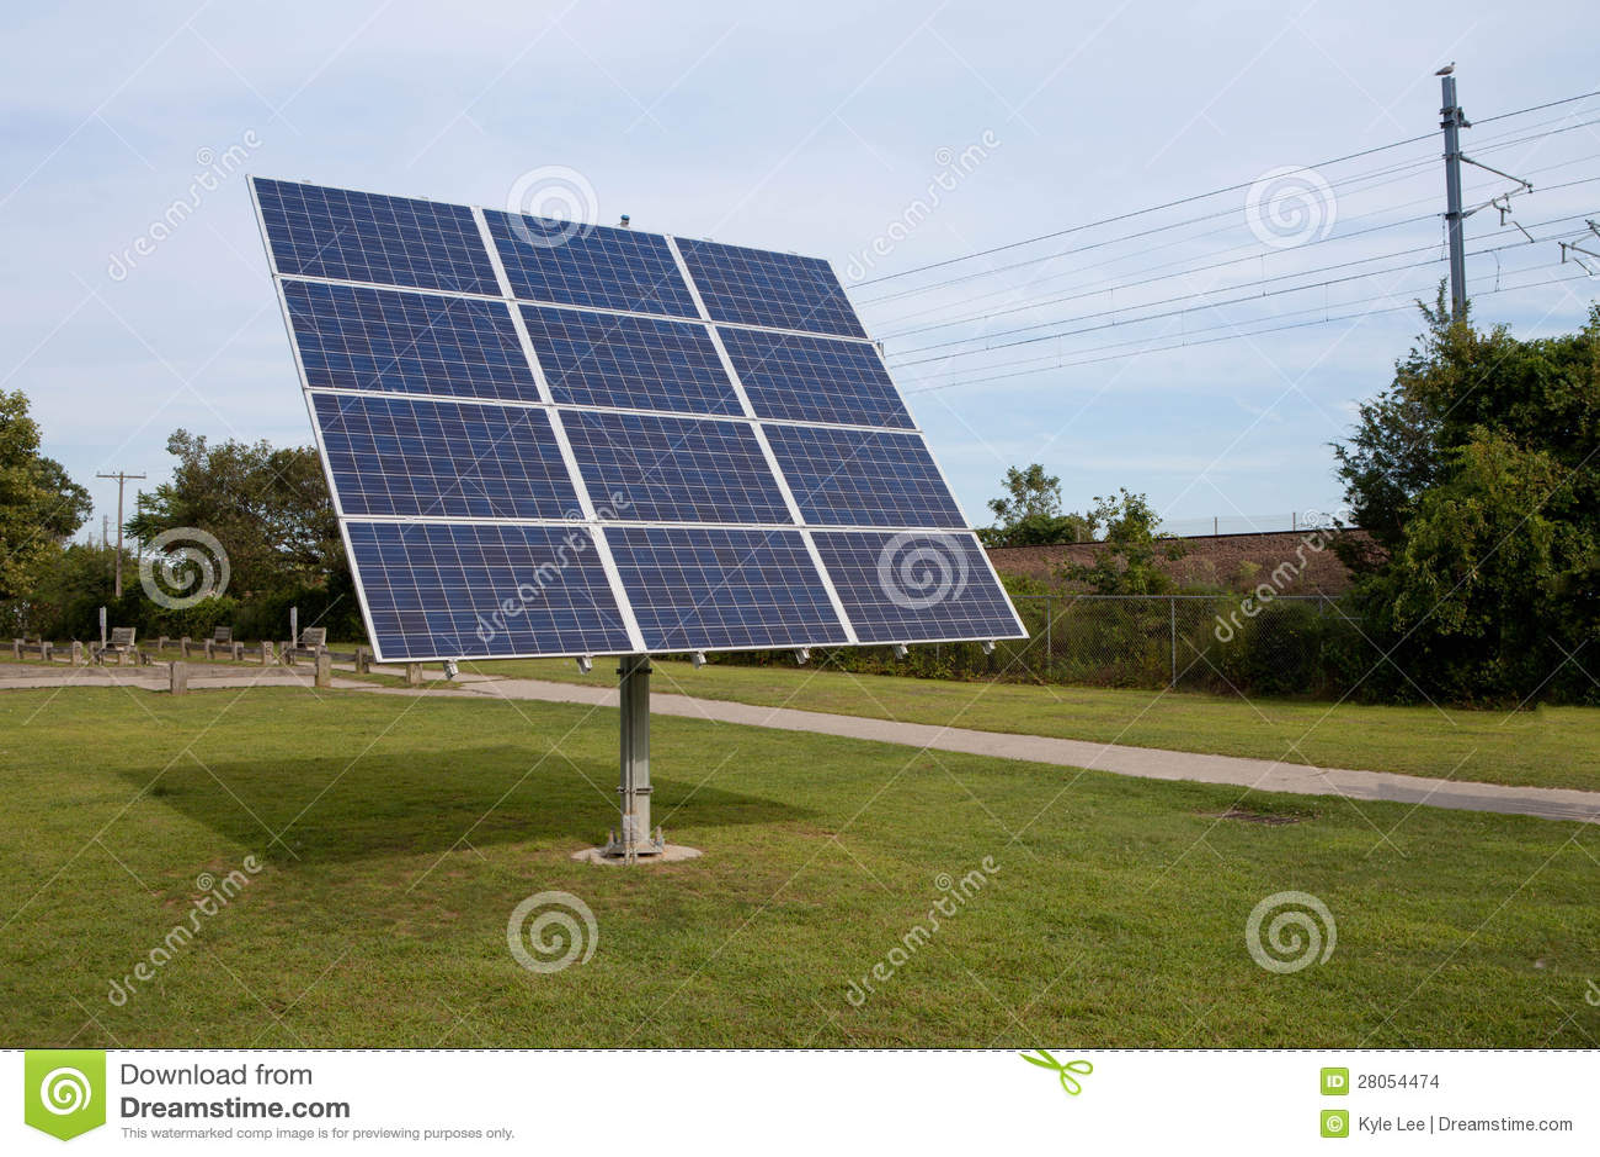 Rotating Solar Panels Stock Images - Image: 28054474